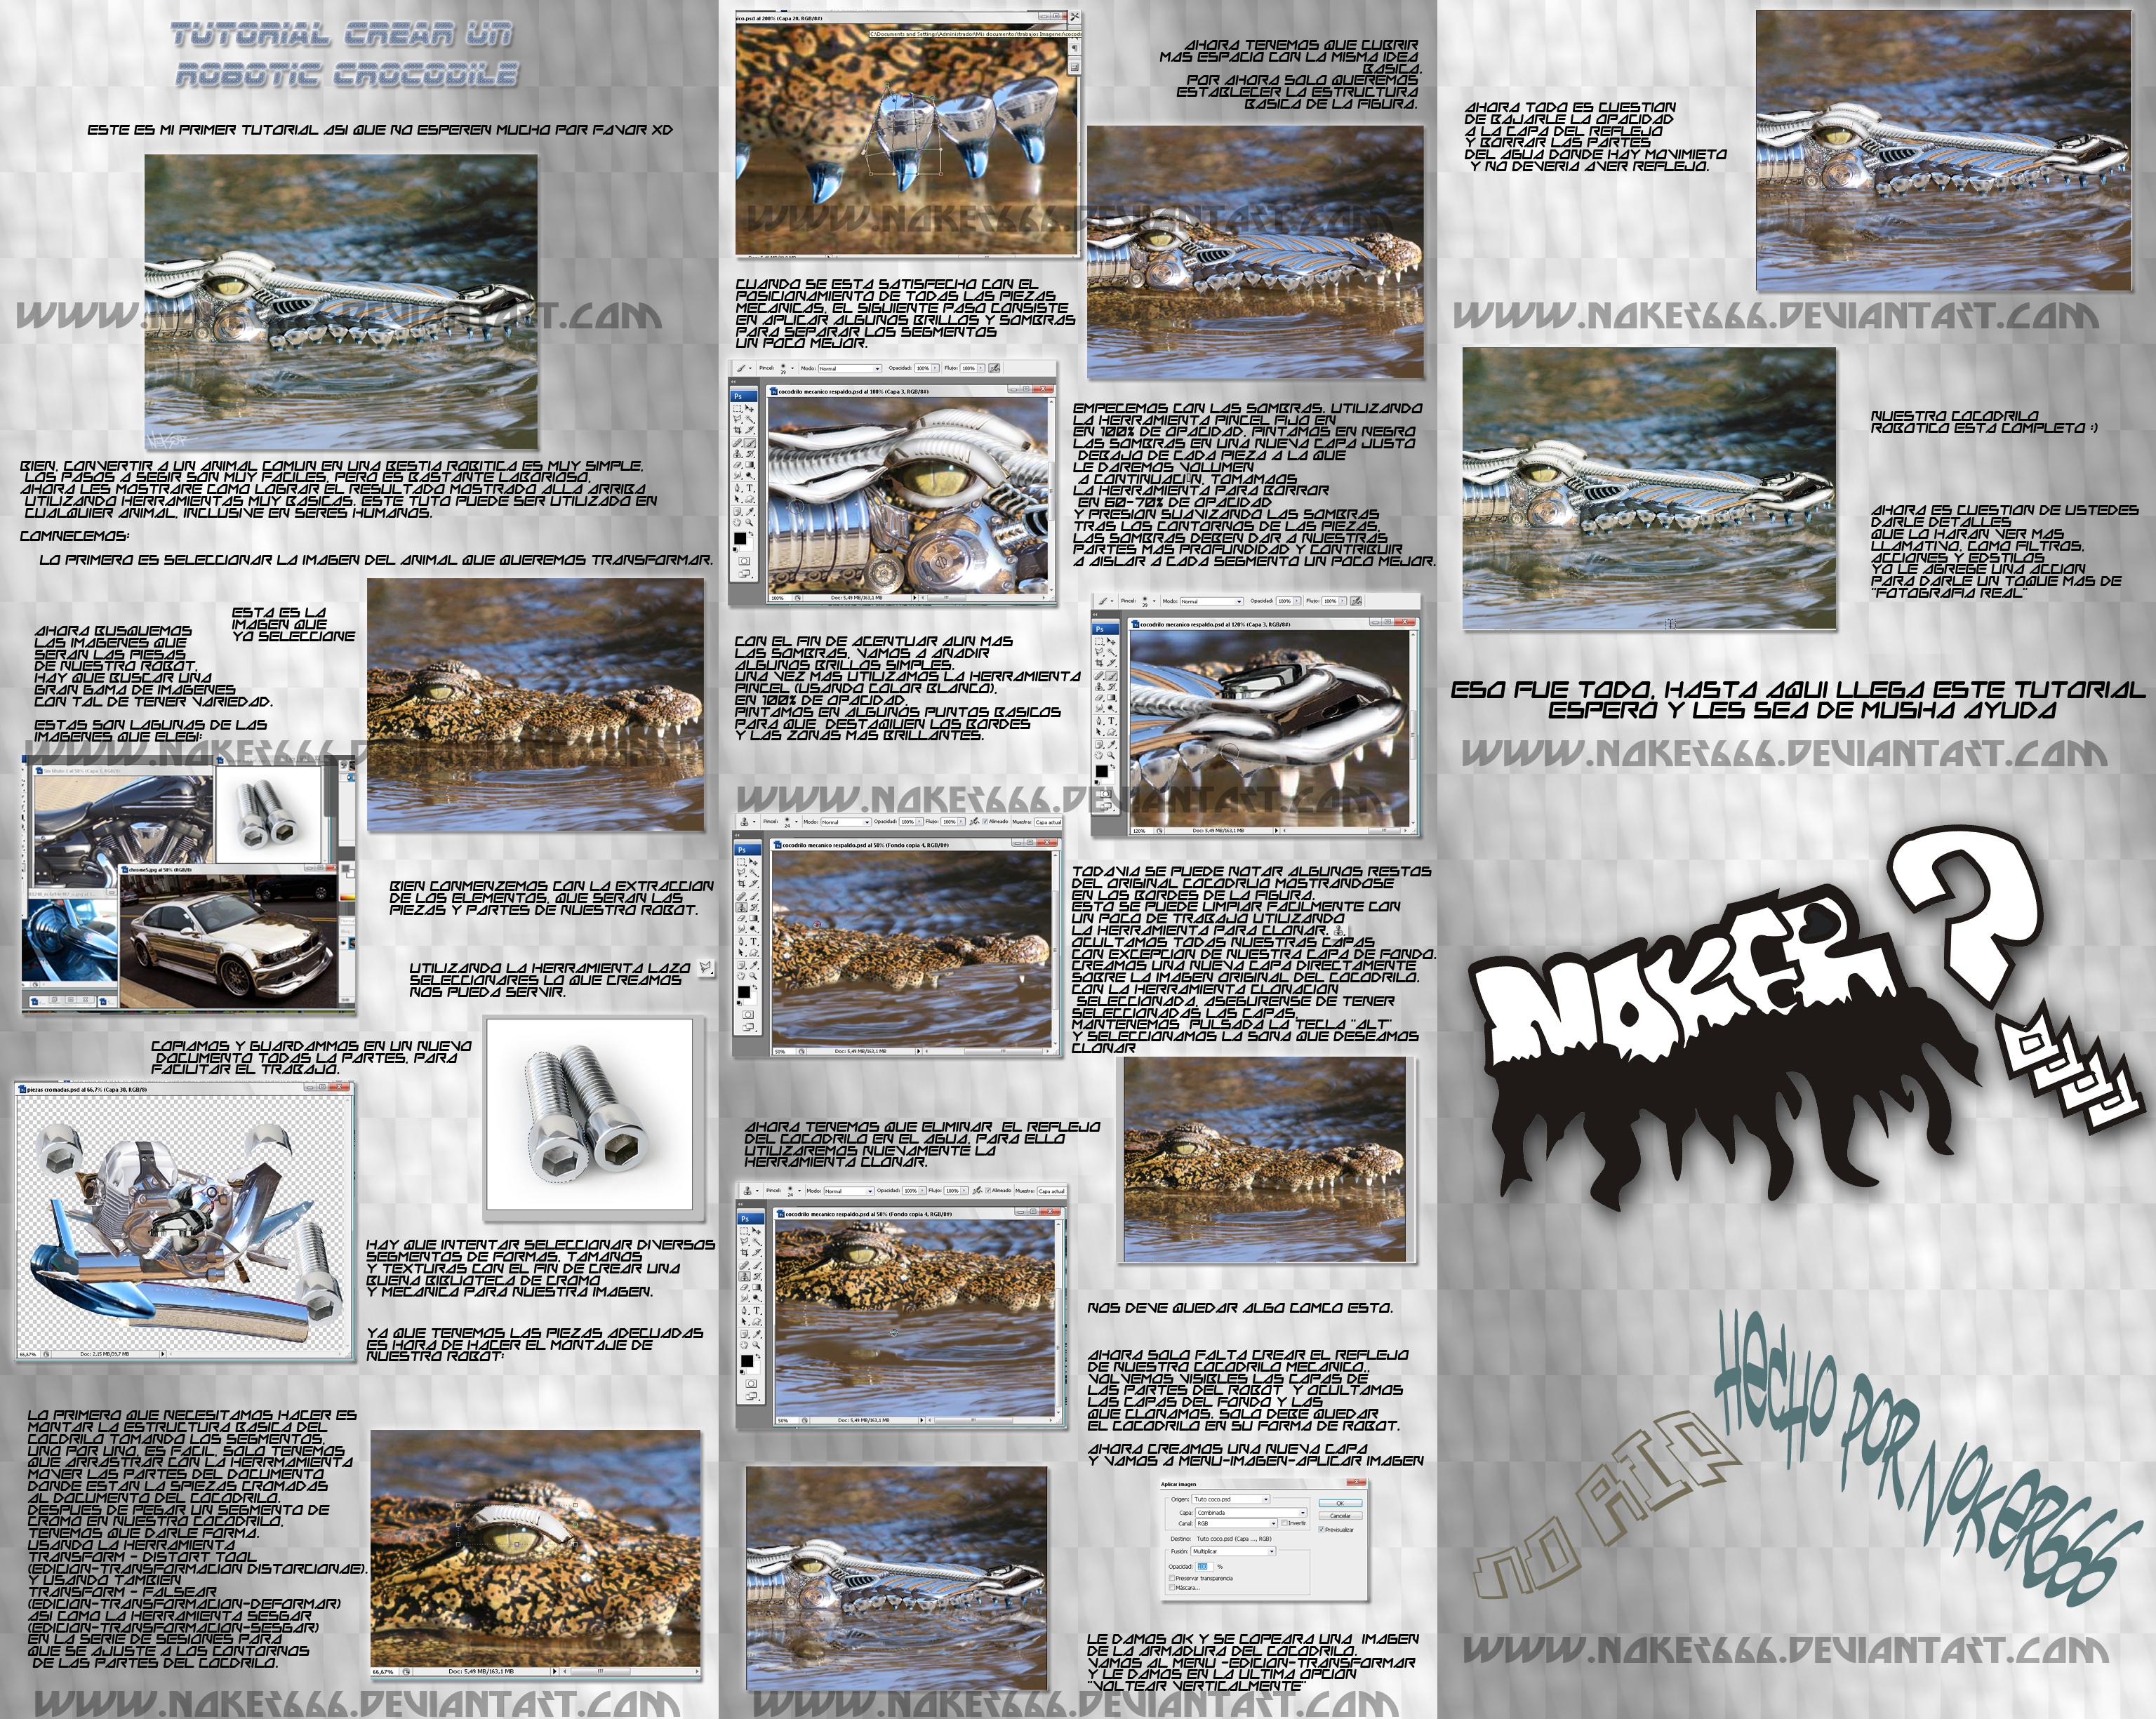 Mechanic Crocodile Tutorial by Noker666